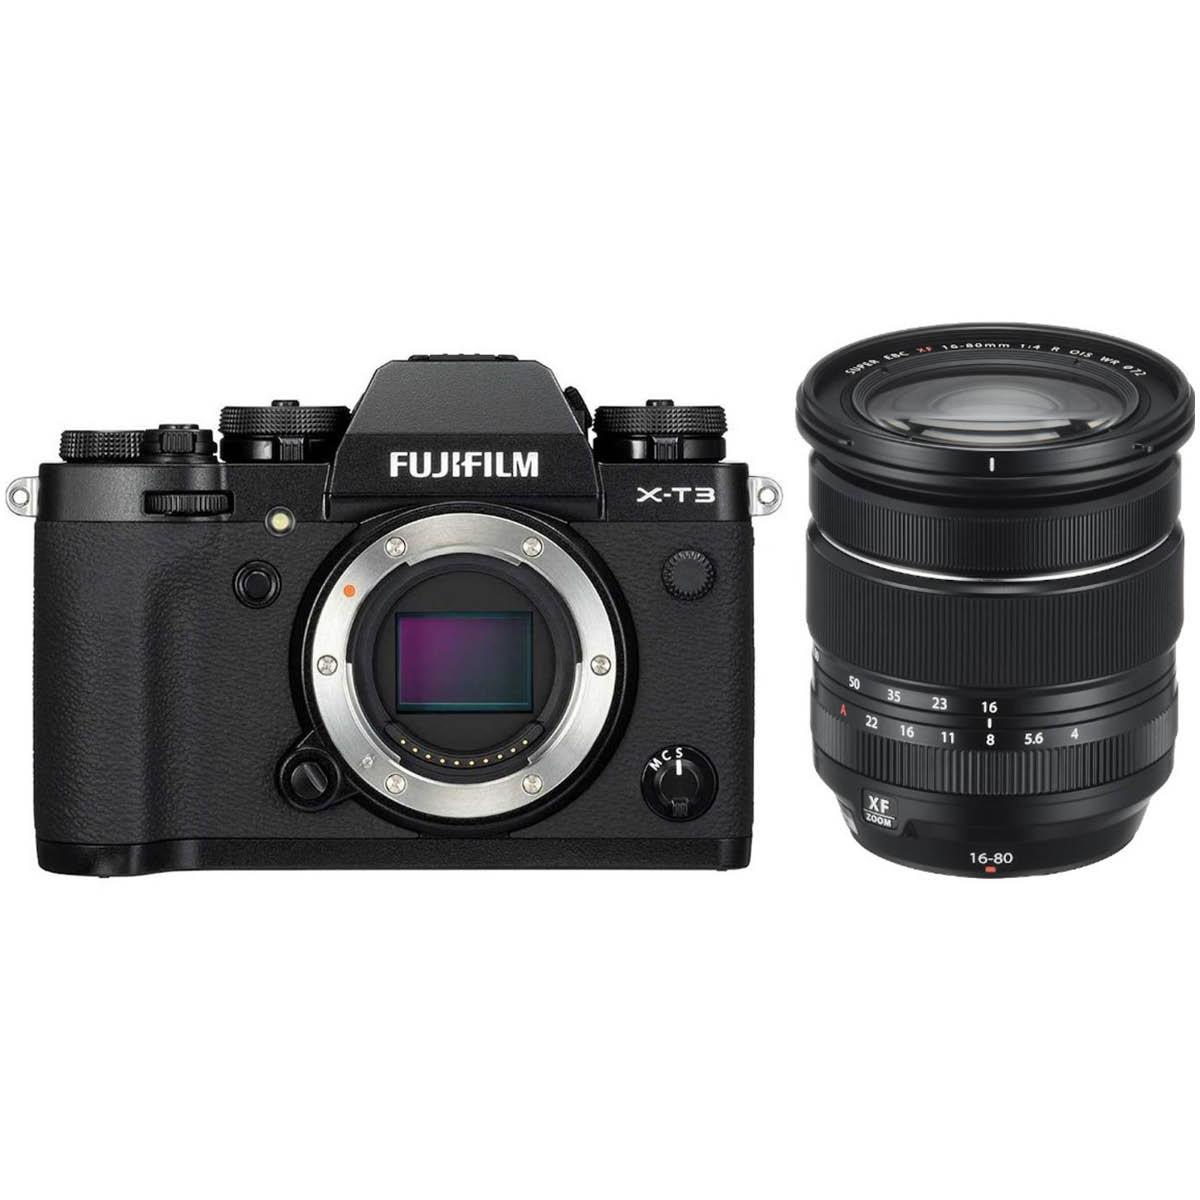 Fujifilm X-T3 mit 16-80 mm 1:4,0 Schwarz